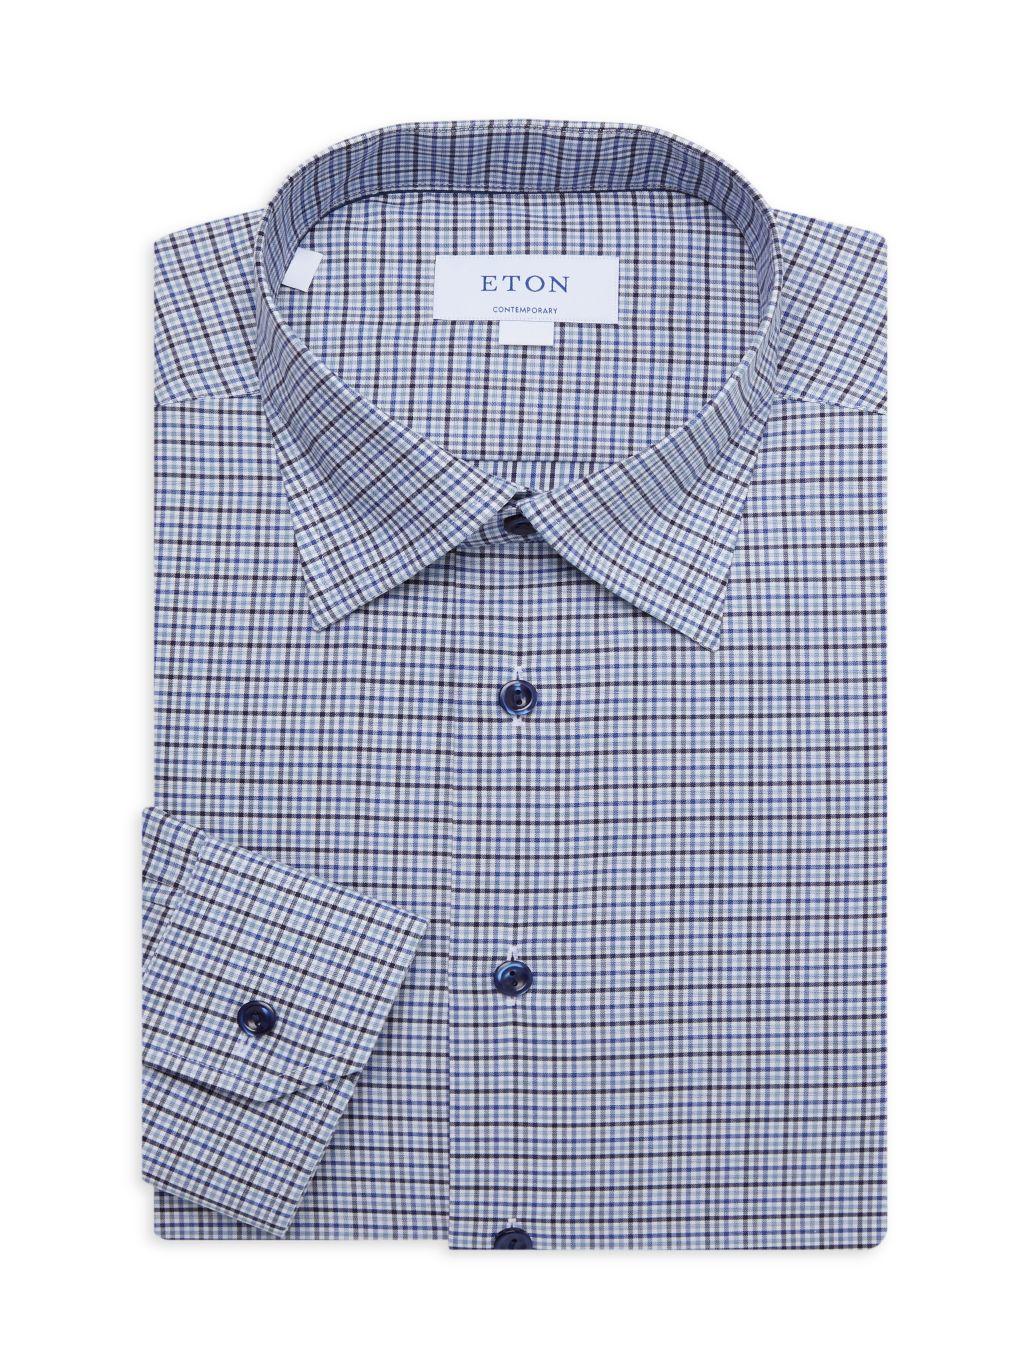 Eton Tattersall Contemporary-Fit Dress Shirt